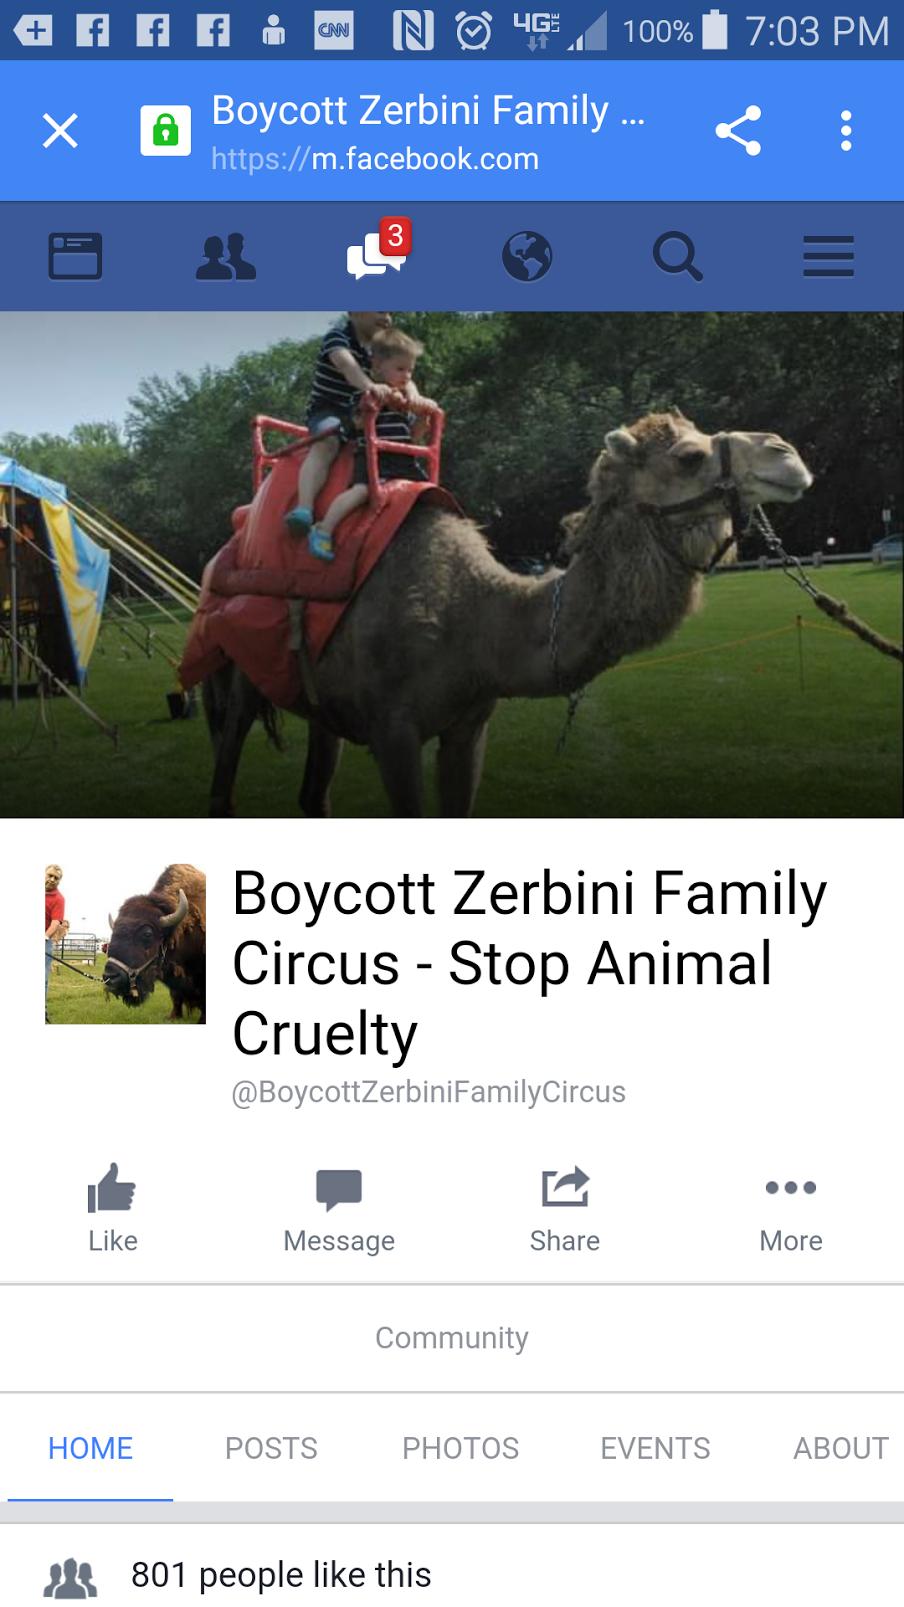 Boycott Zerbini Family Circus